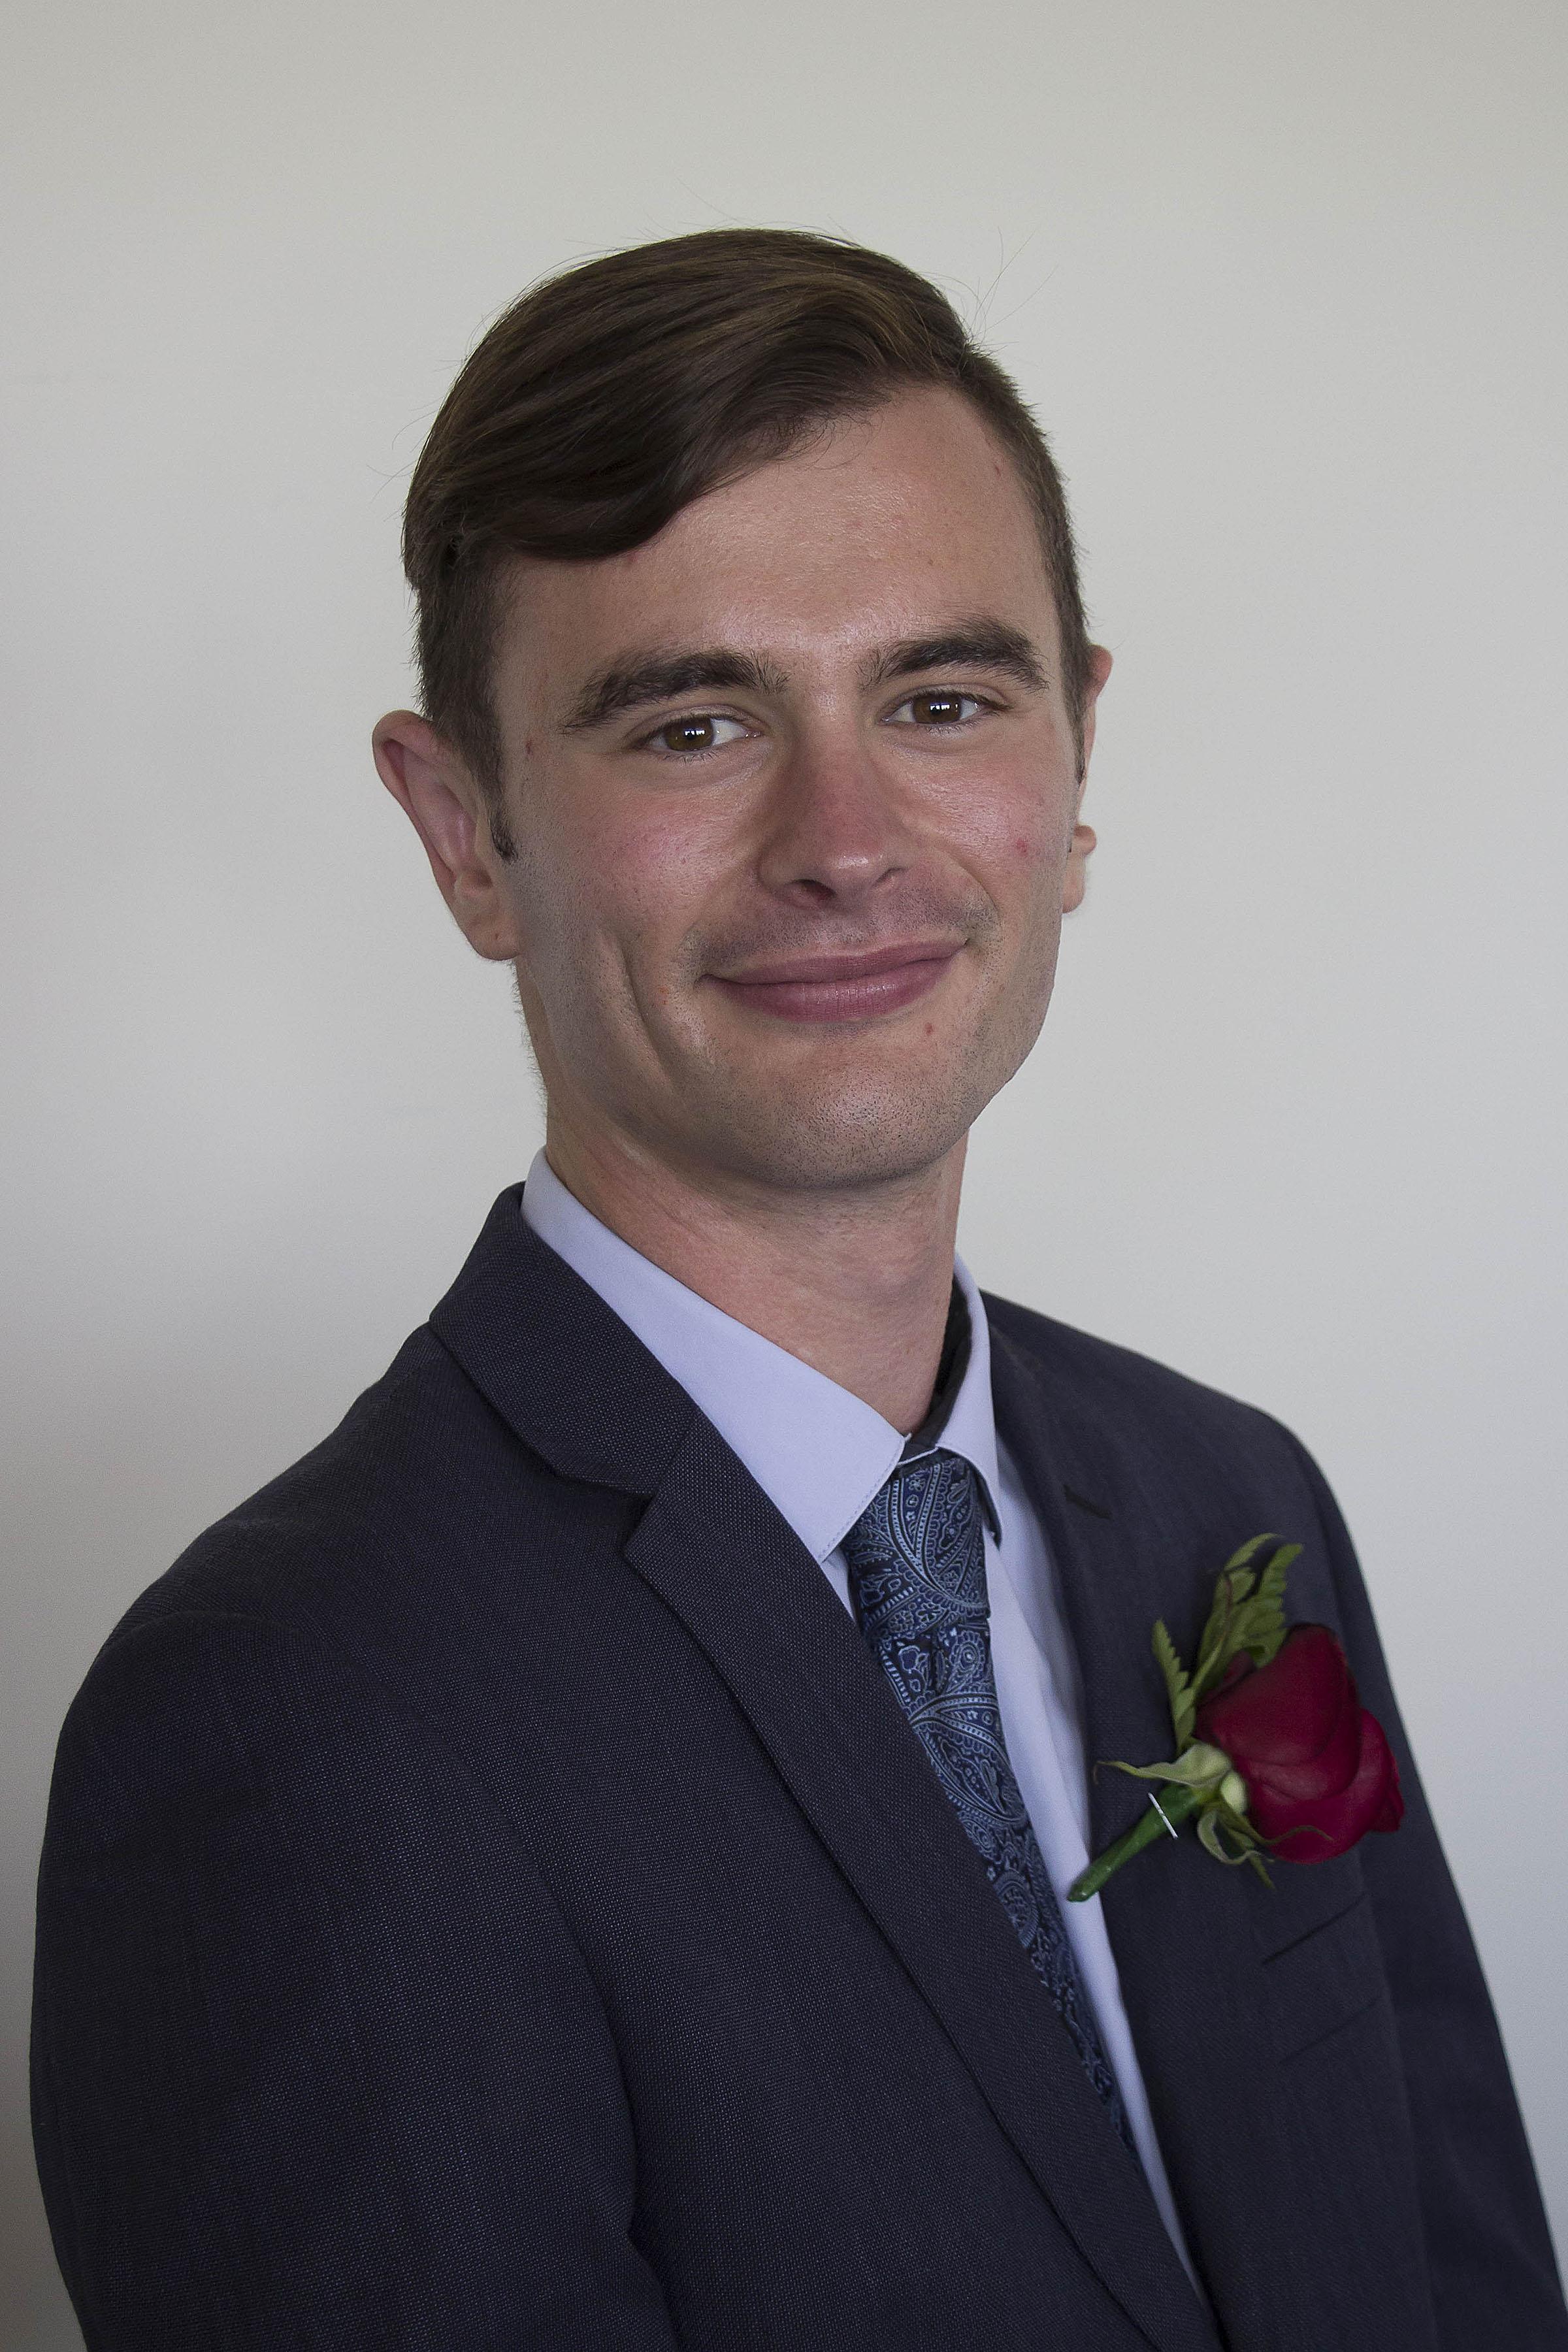 Deputy Mayor Latham Martin